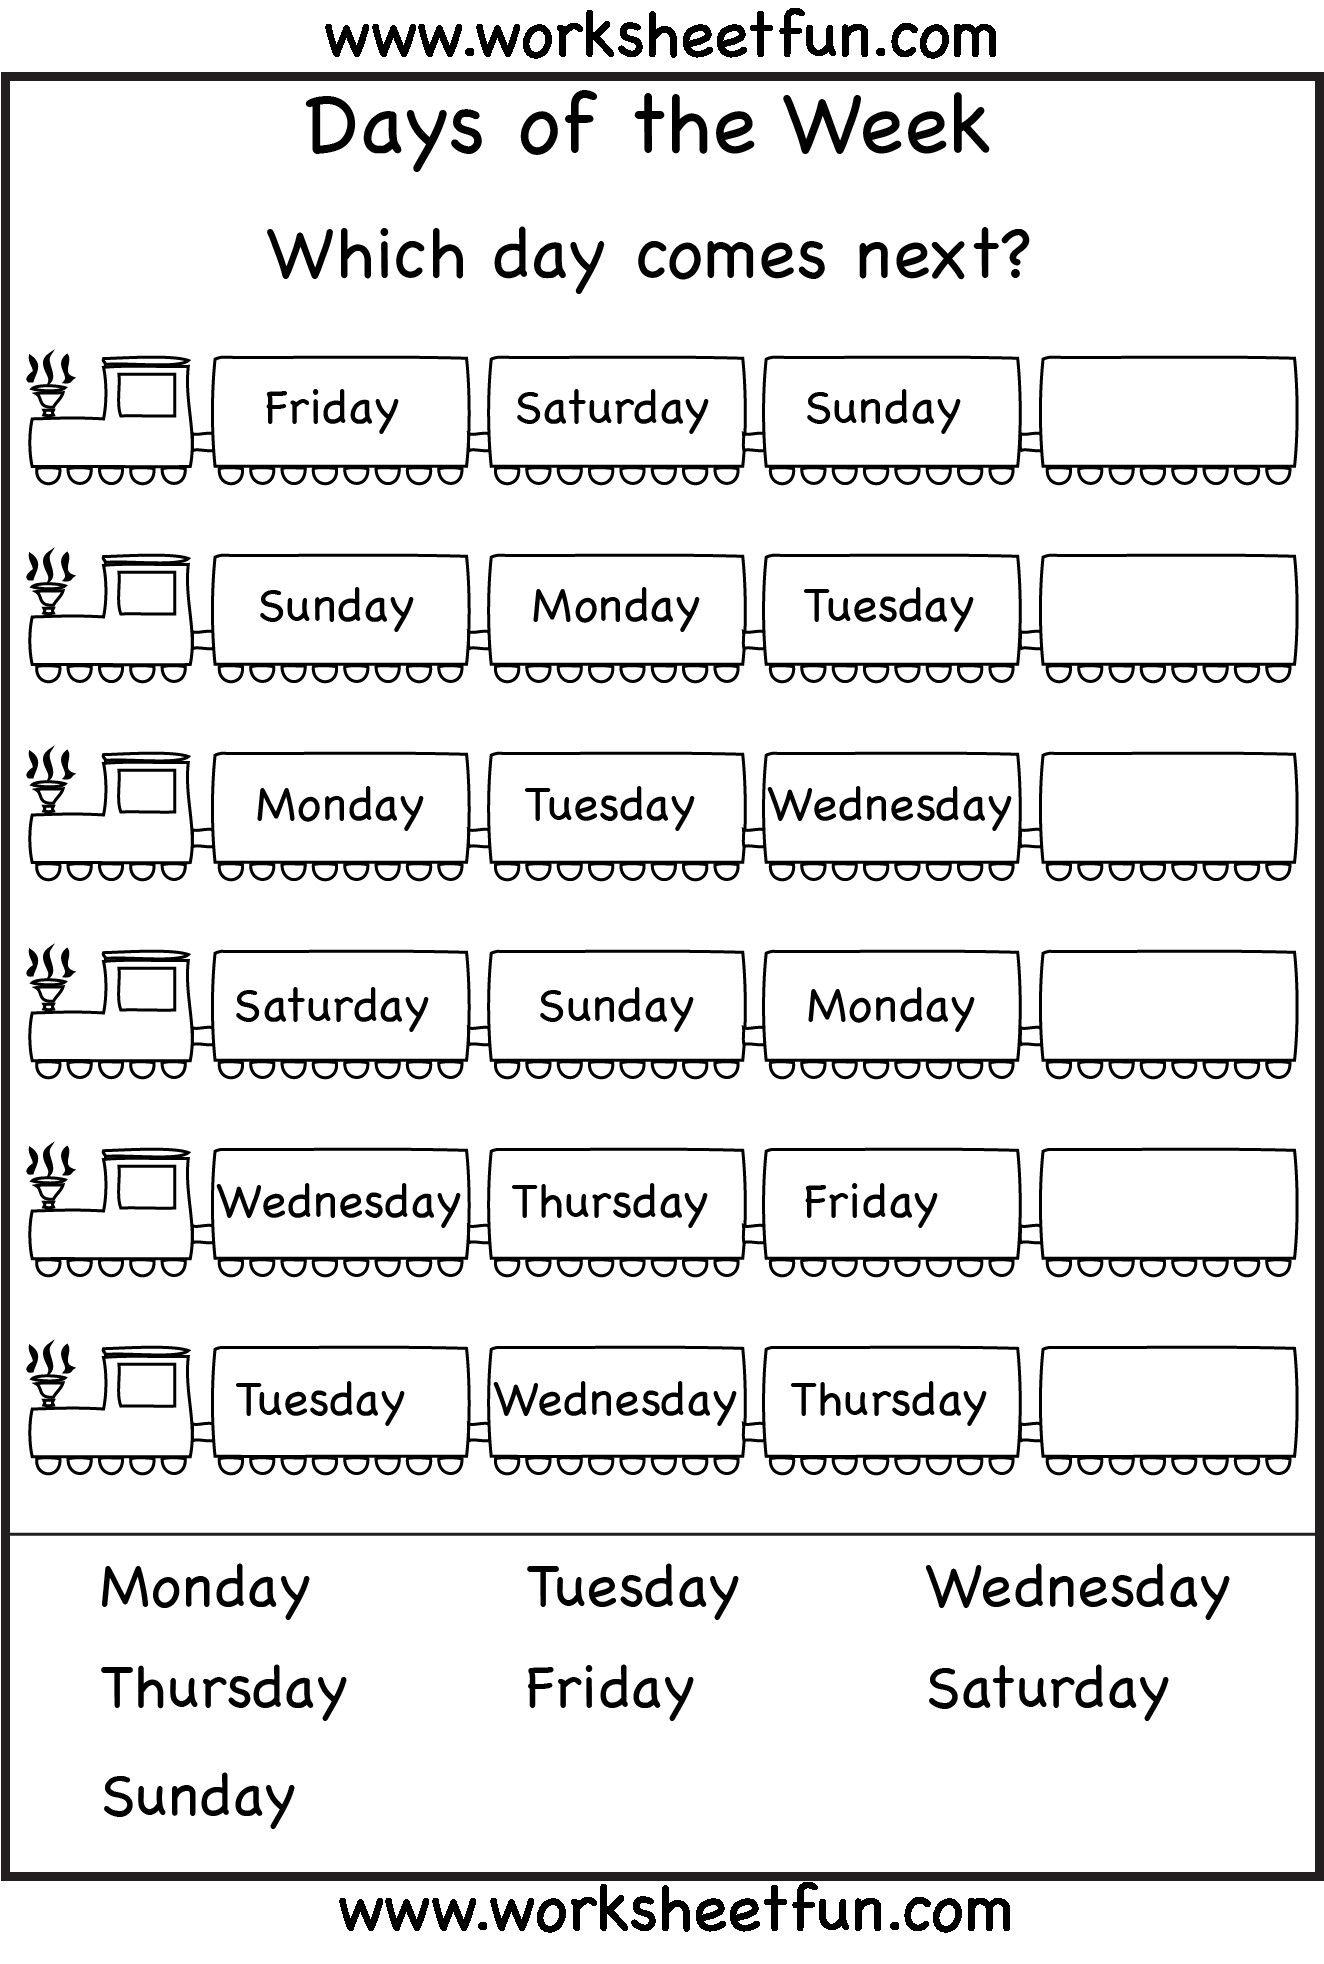 3 Teacher Worksheets For Kindergarten Days Of The Week Worksheet In 2020 Preschool Worksheets English Worksheets For Kids 2nd Grade Math Worksheets